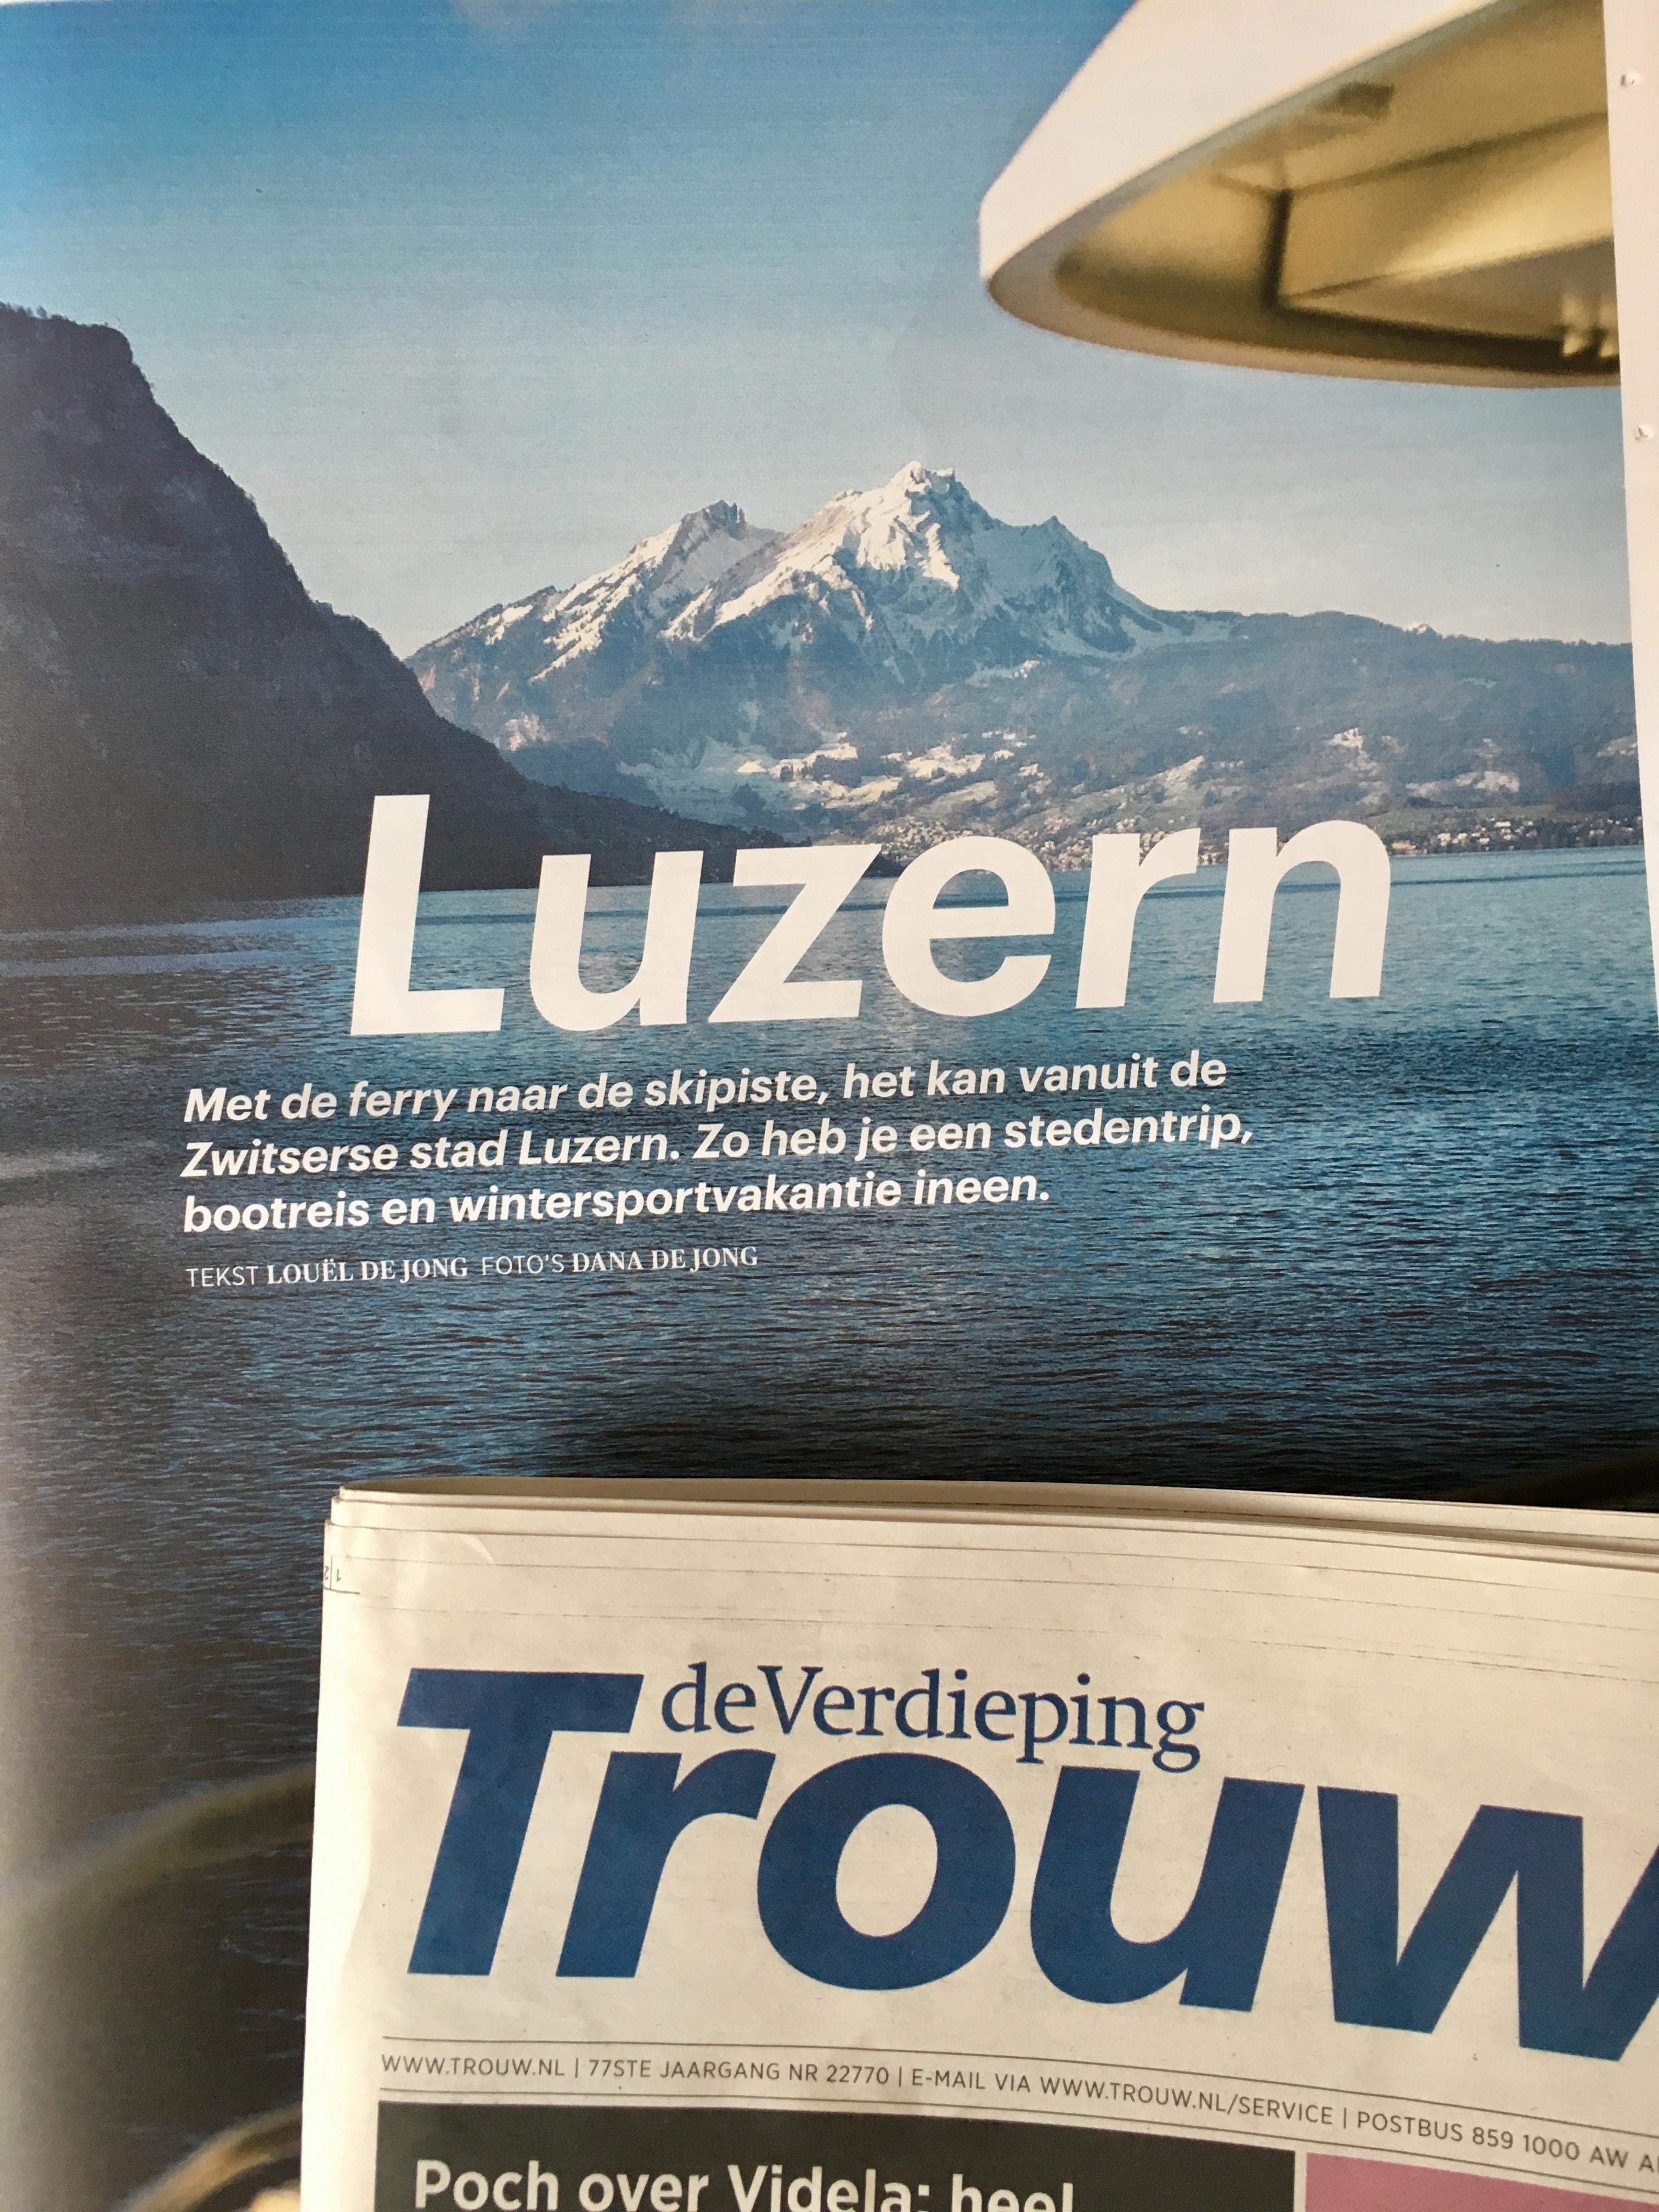 Zwitserland dating service